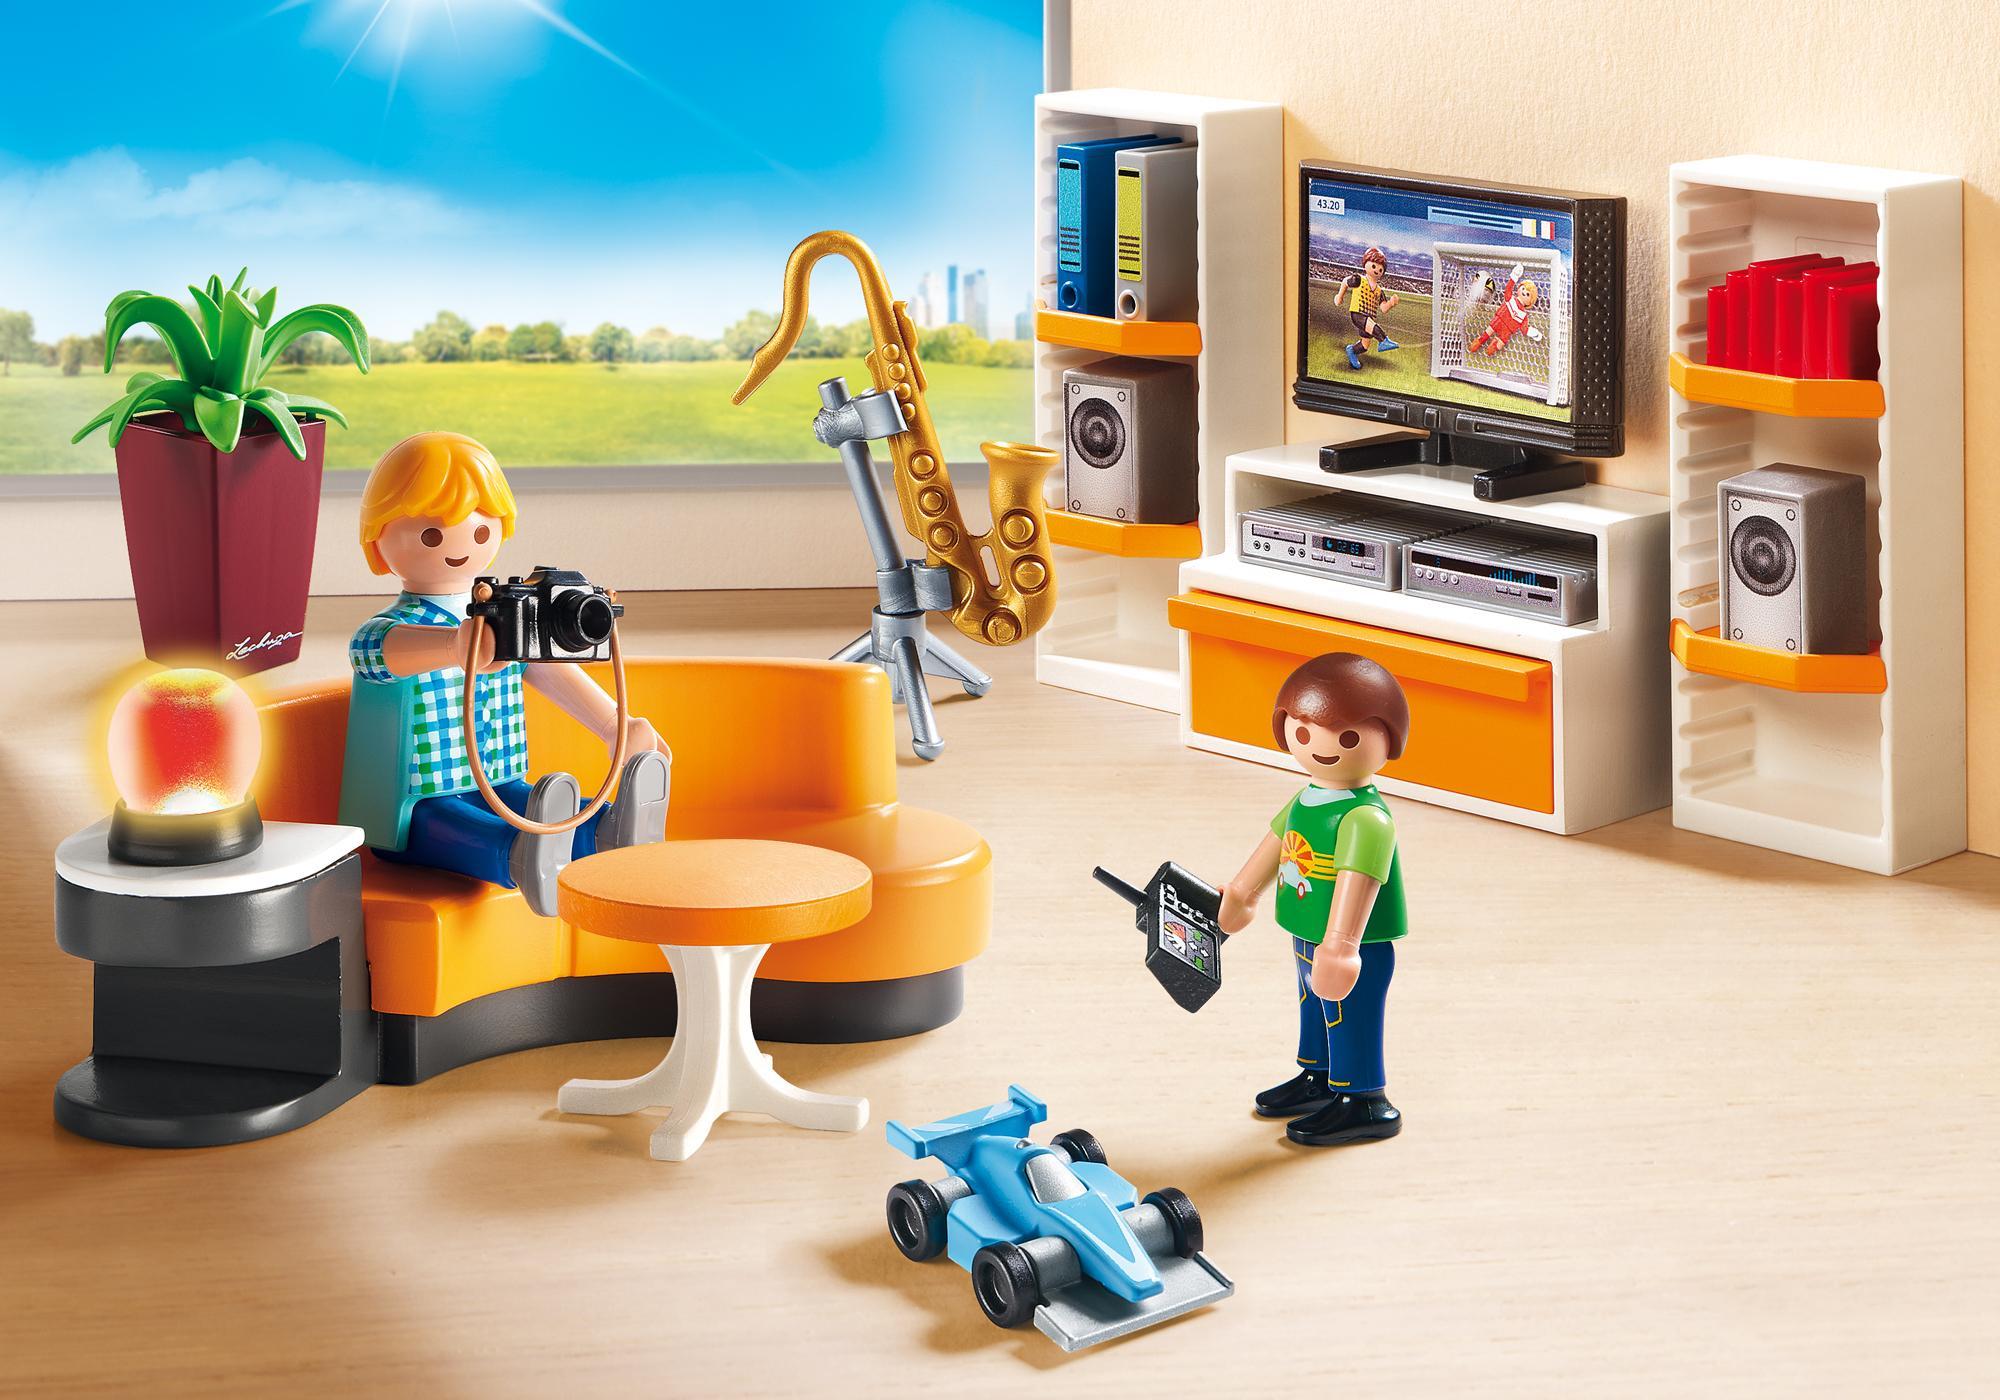 http://media.playmobil.com/i/playmobil/9267_product_detail/Wohnzimmer